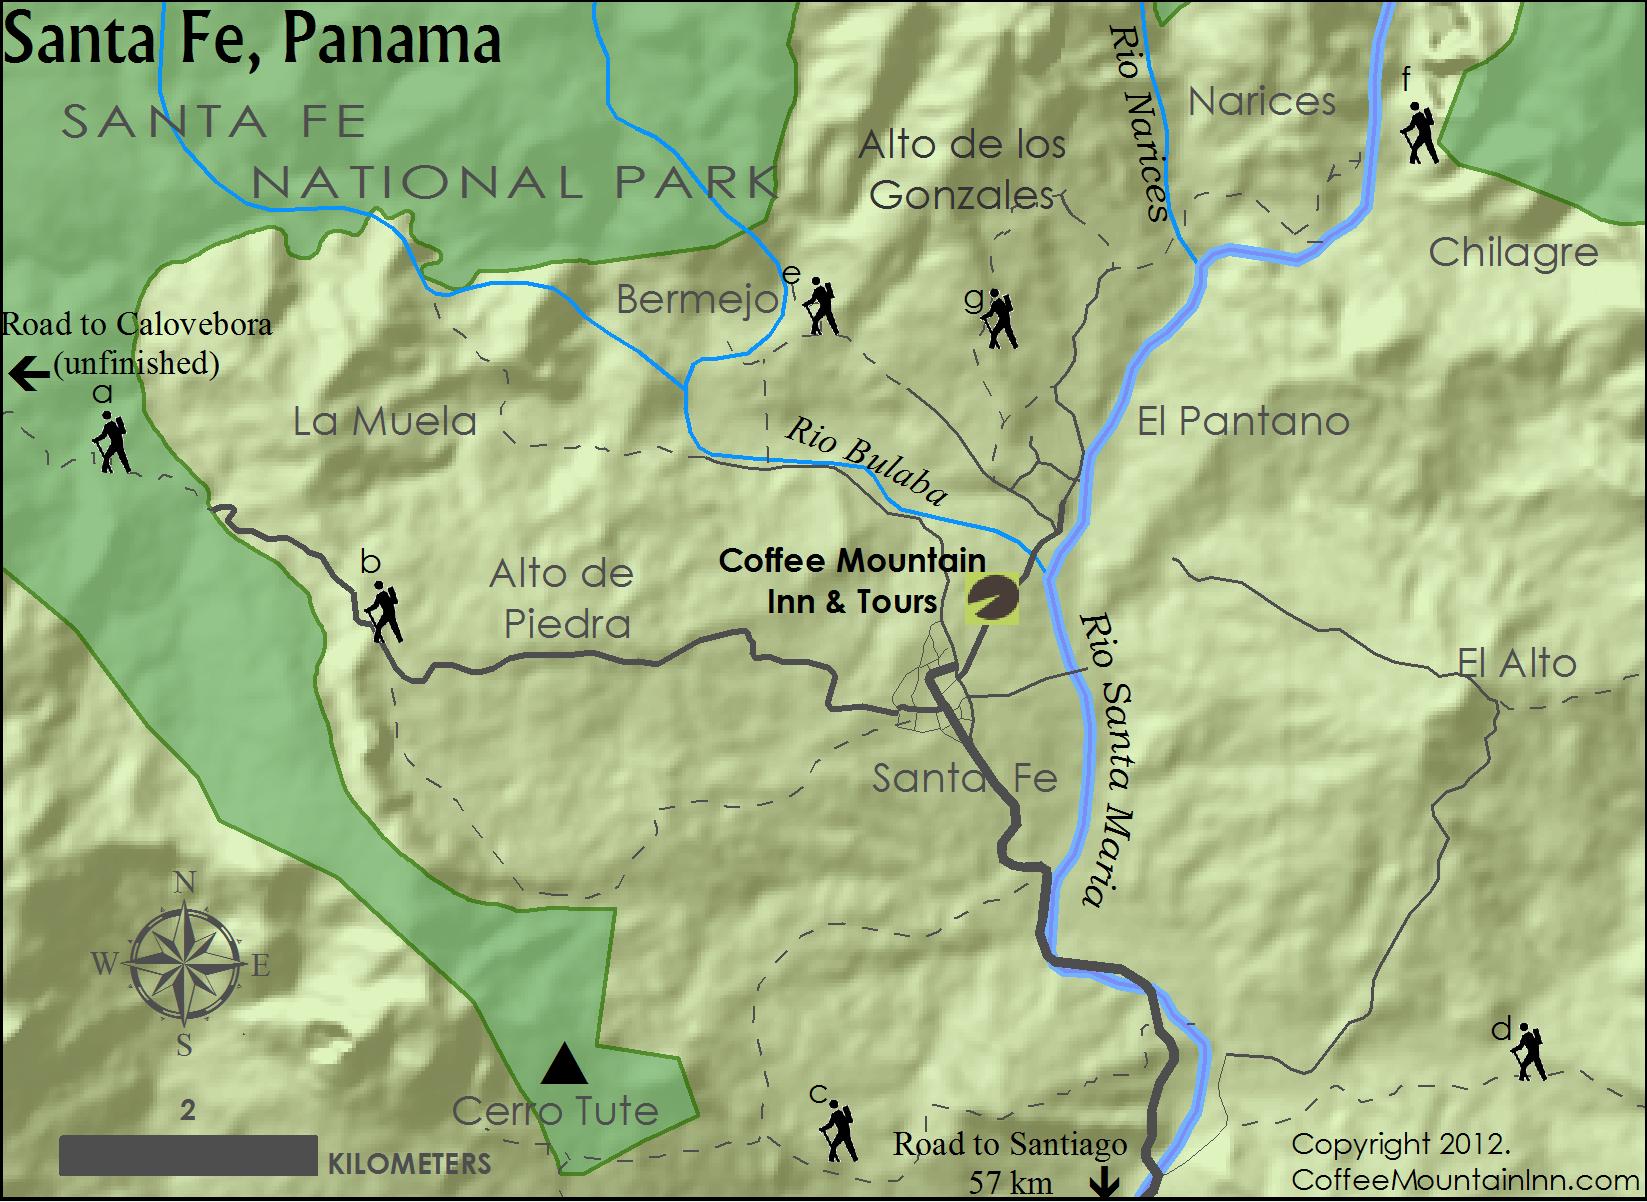 Trail and Hiking Optionns, Santa Fe